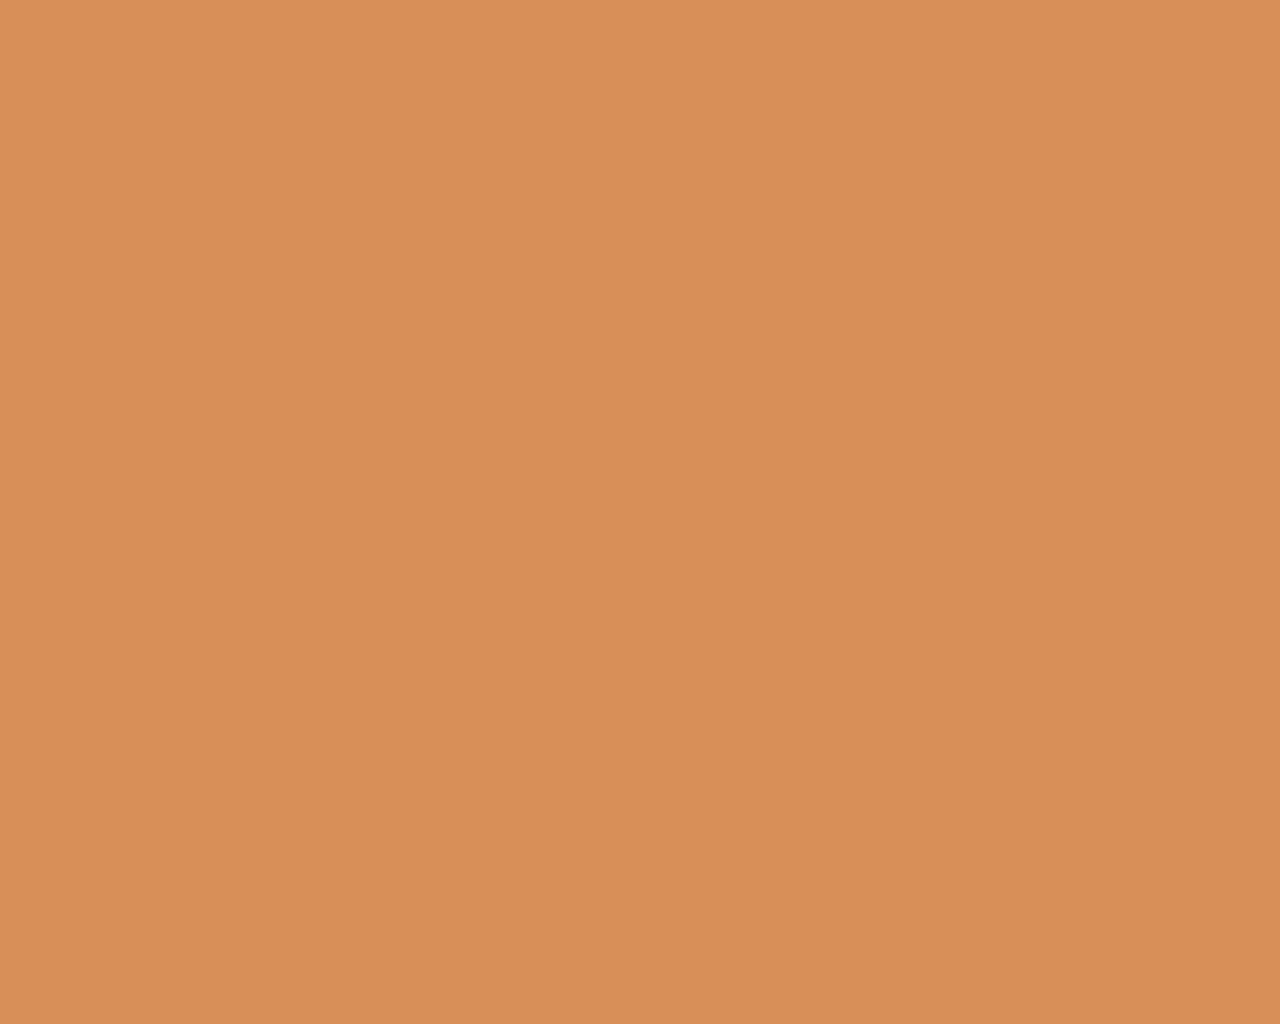 1280x1024 Persian Orange Solid Color Background